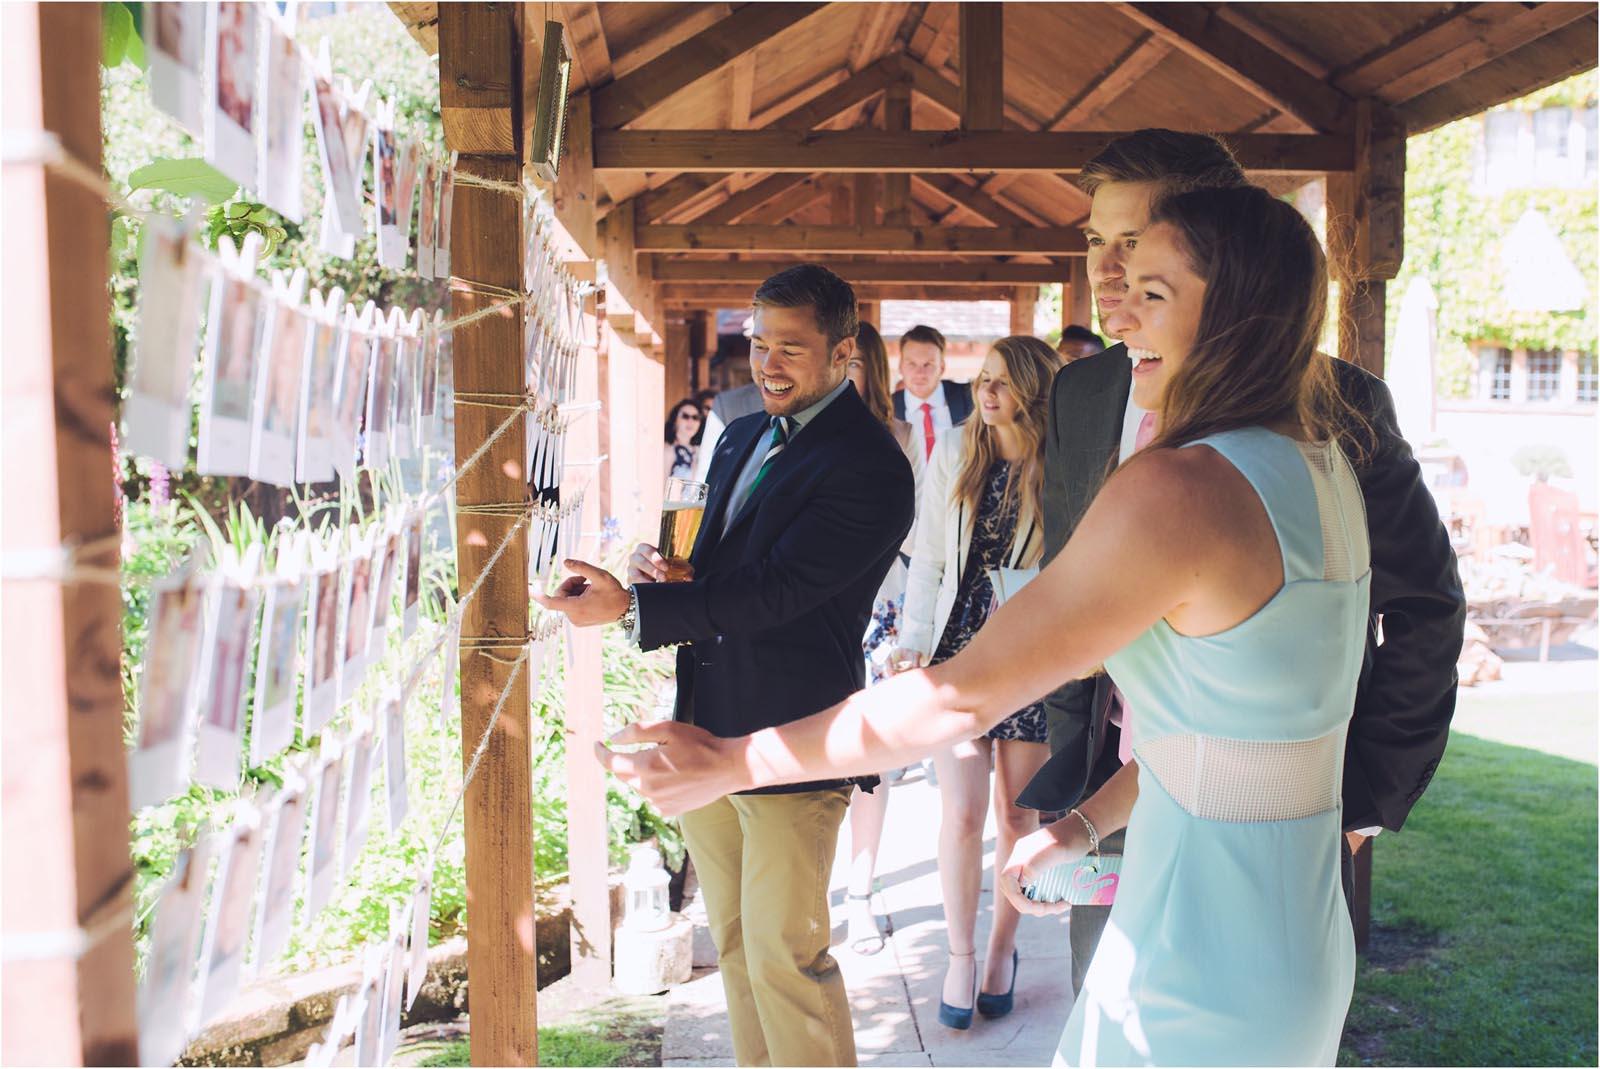 Simon biffen wedding photography 0100